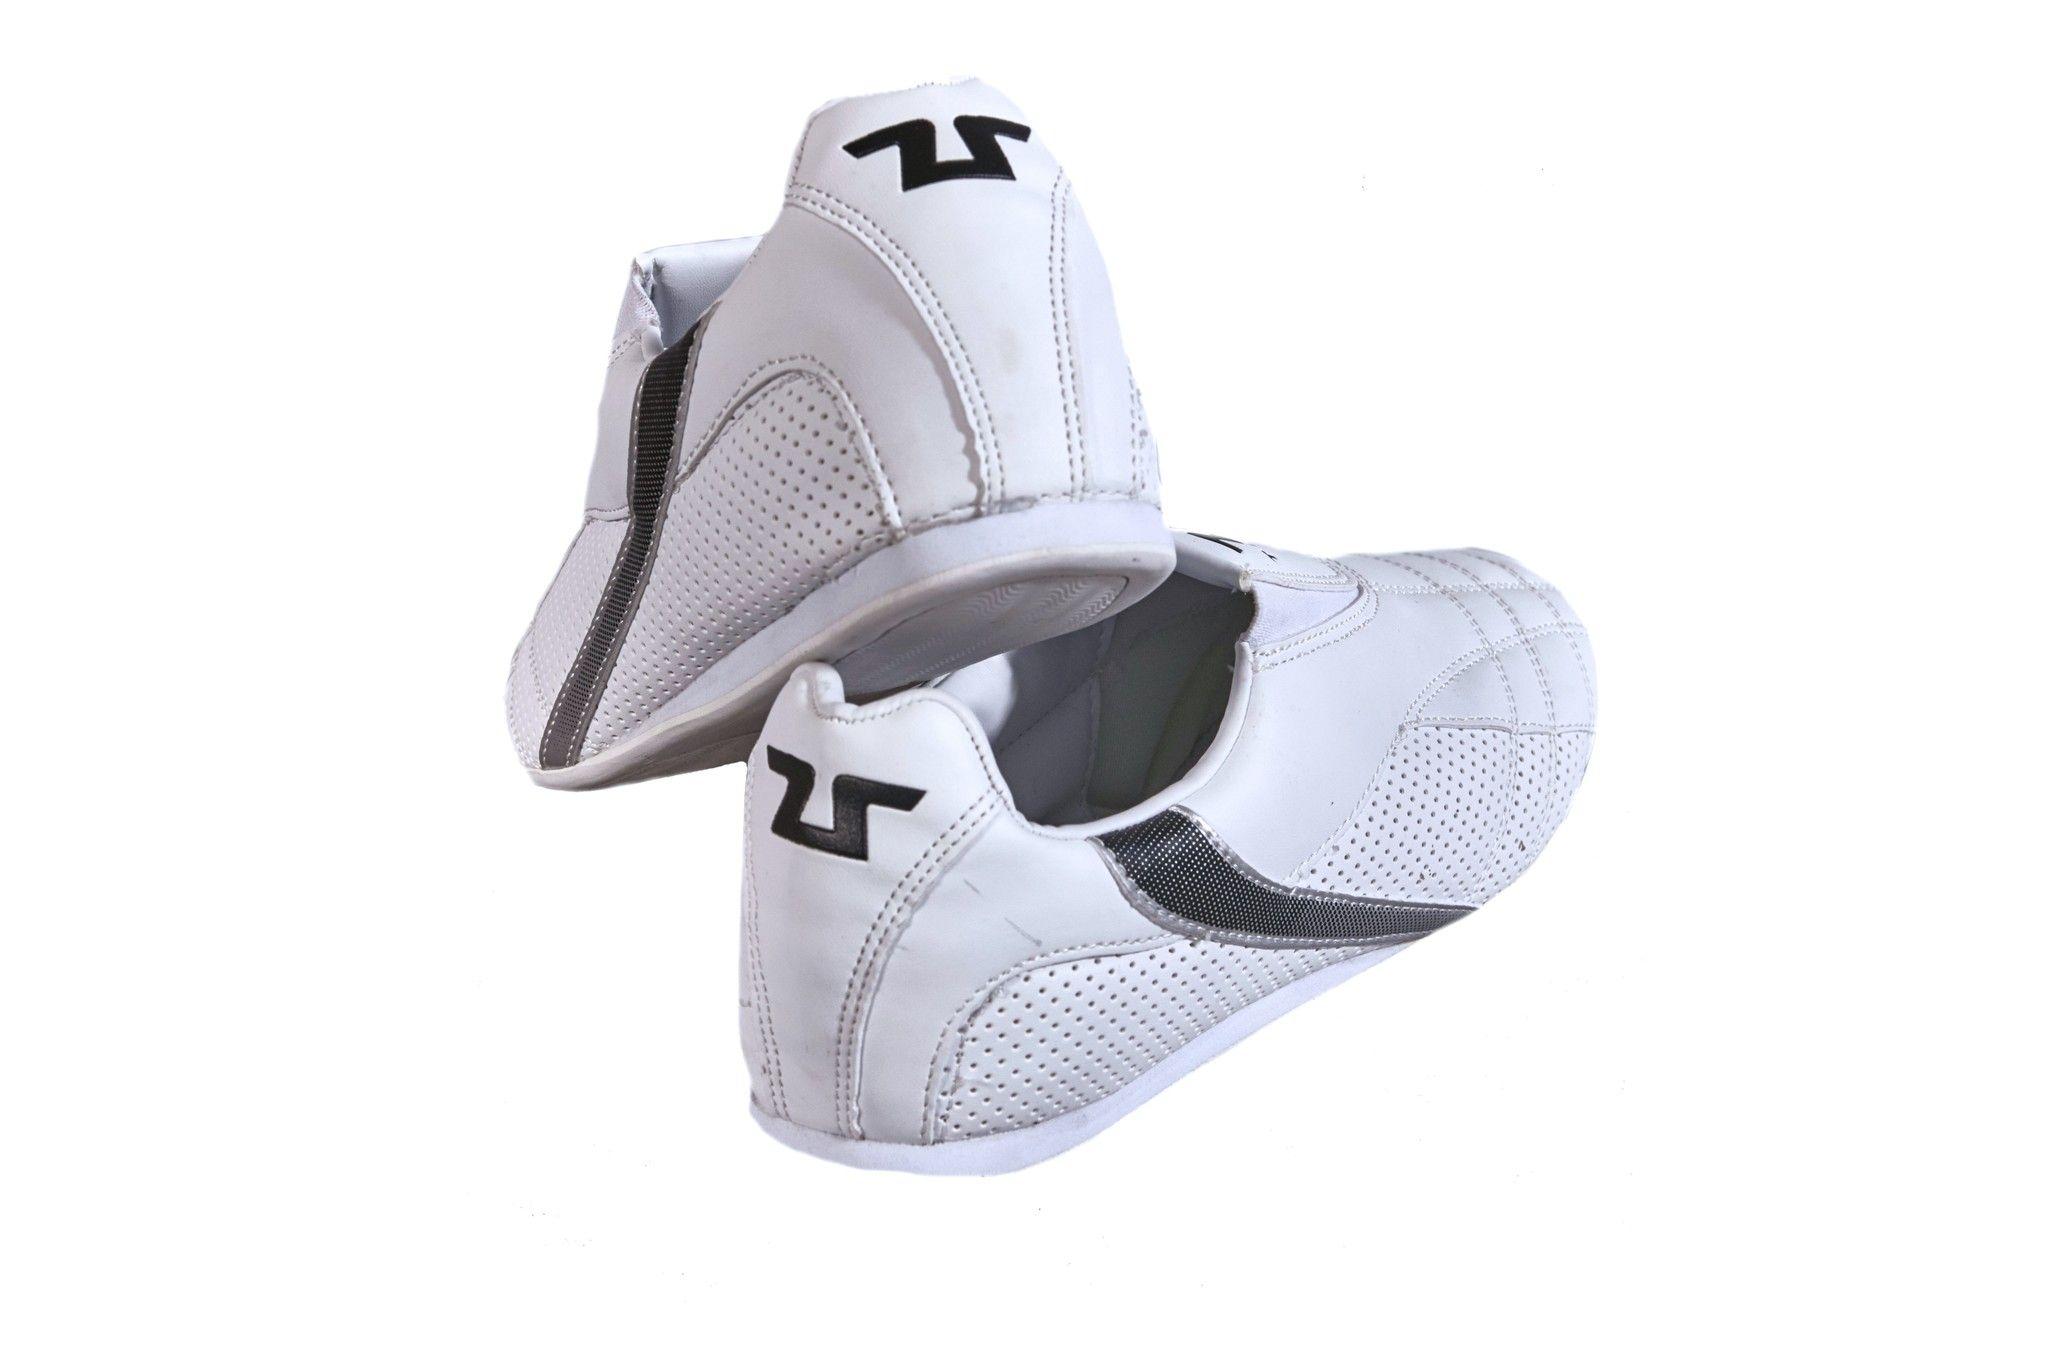 new concept 86011 4edd9 Tusah - Scarpetta Training per Taekwondo, Karate ed Arti Marziali made in  Corea ideale per